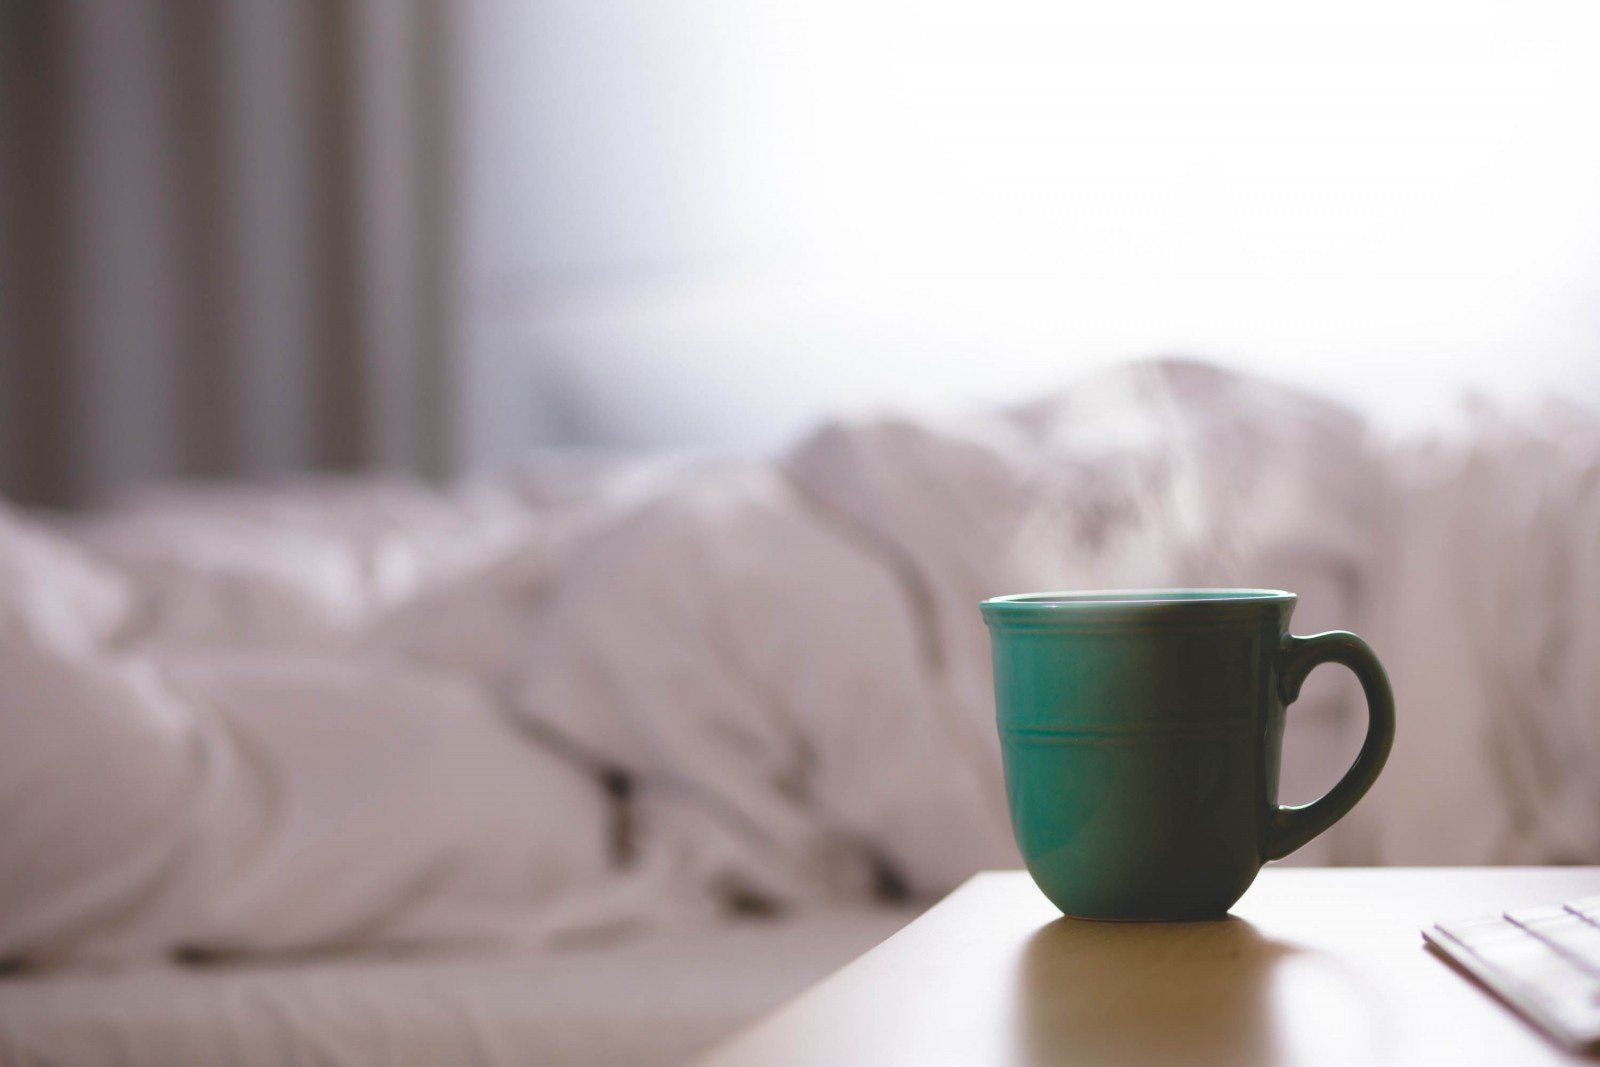 Mug on the bedside table